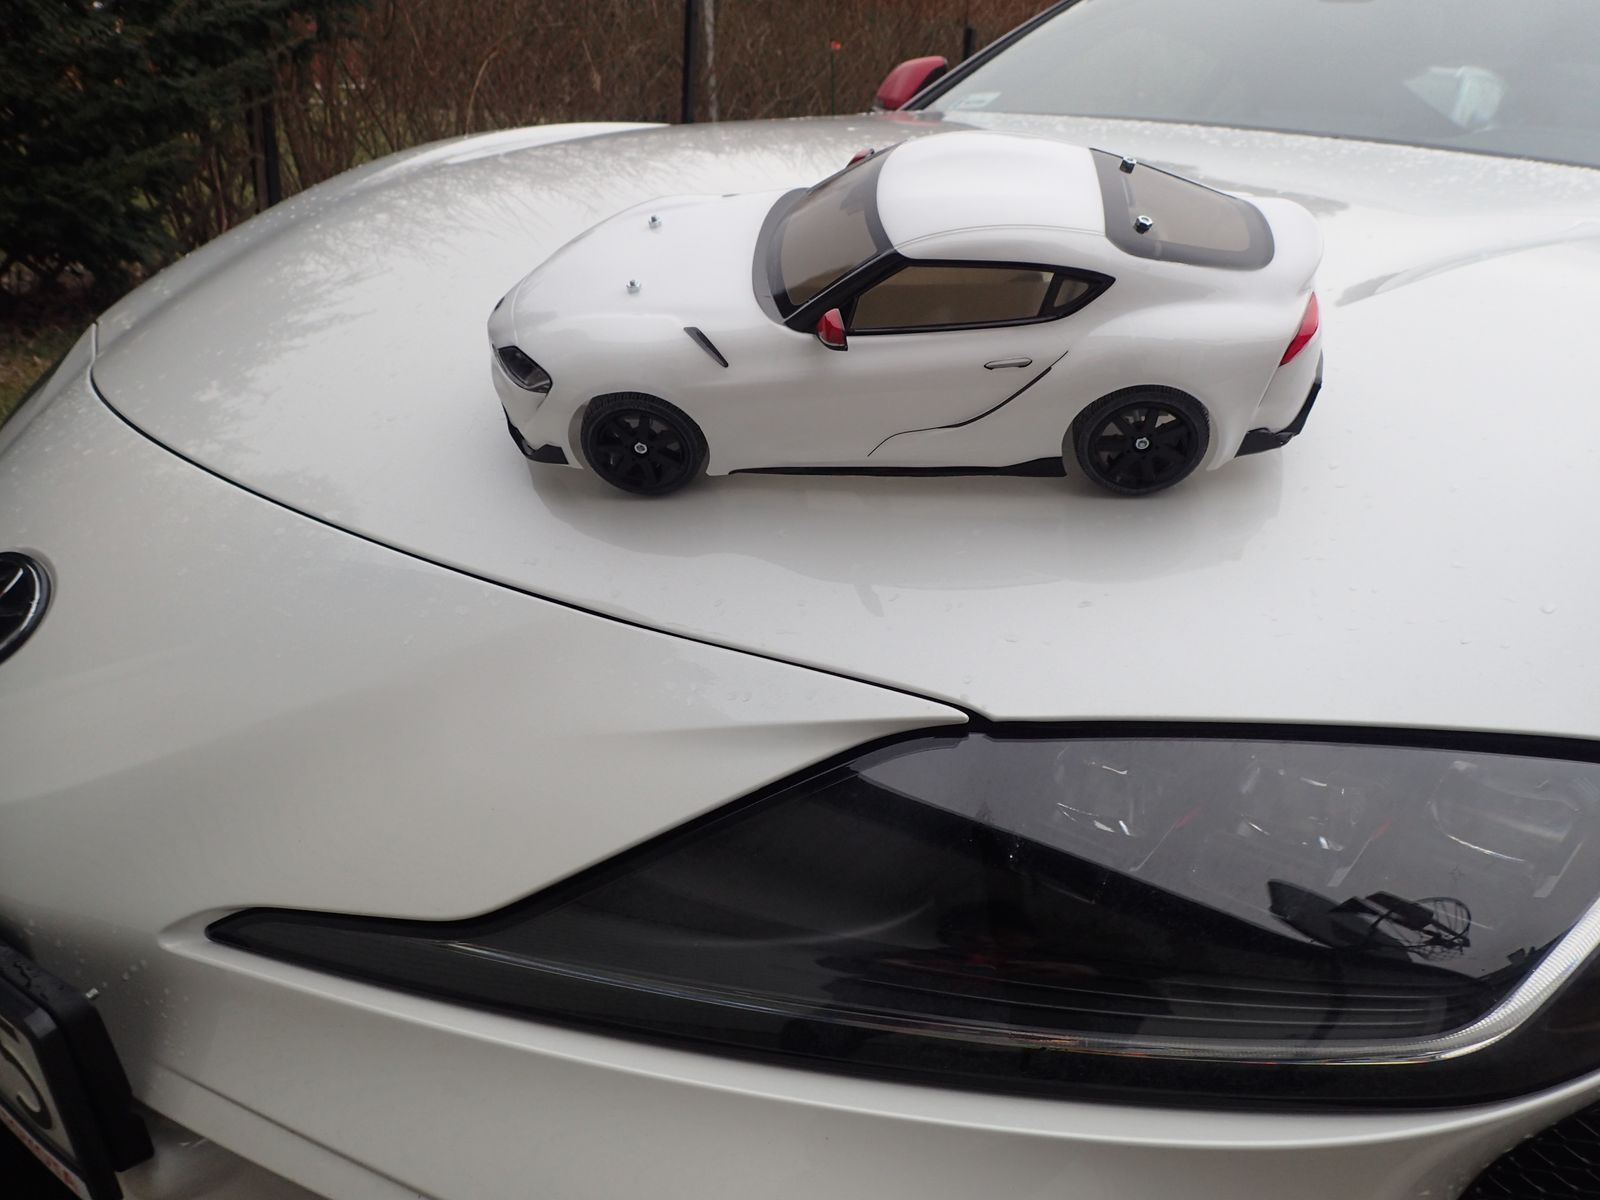 Tamiya Toyota GR Supra